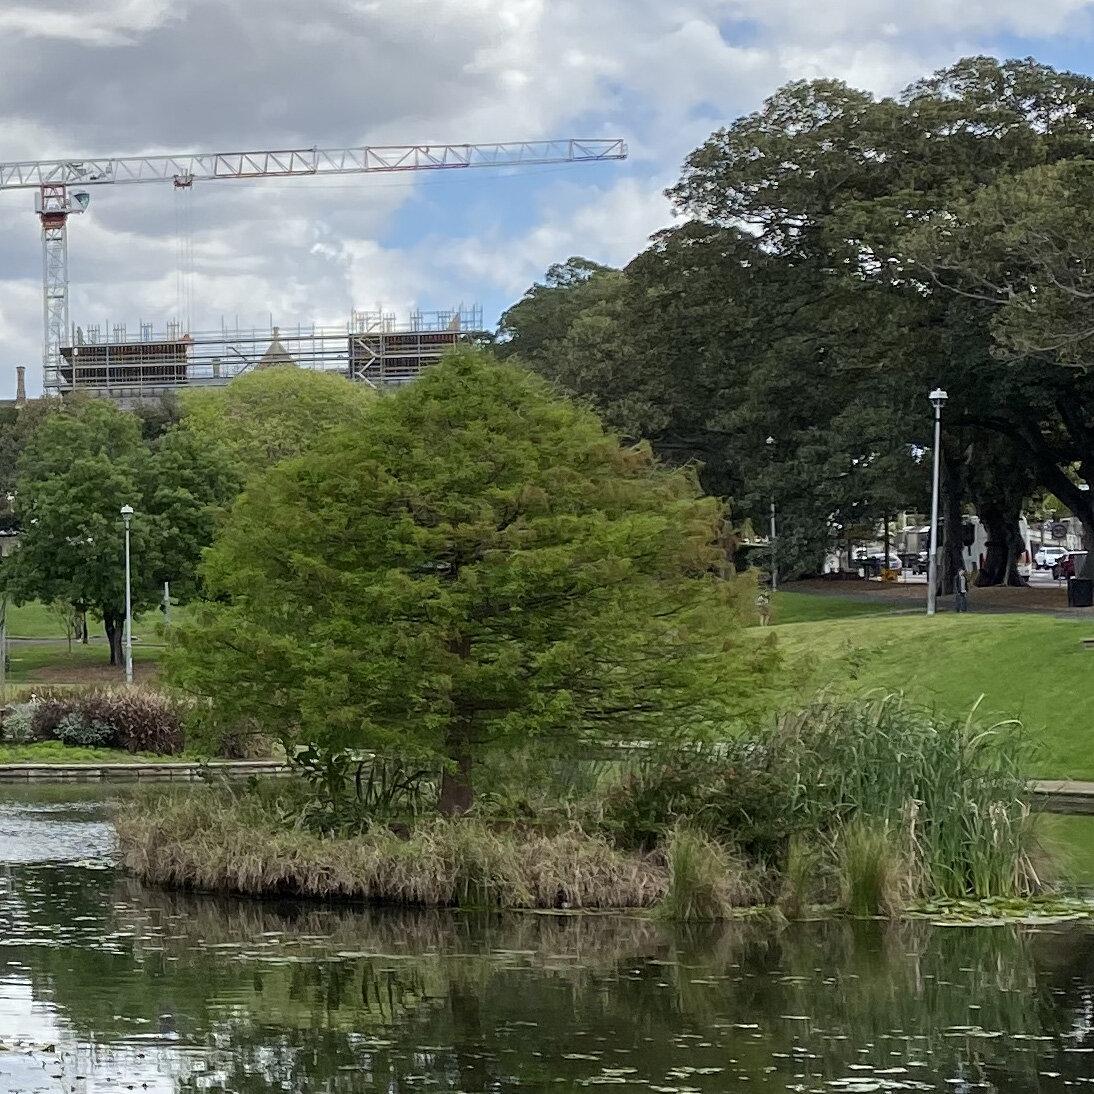 Lake Northam, Victoria Park, Sydney (iPhone 11 Pro - normal lens) - 100% crop